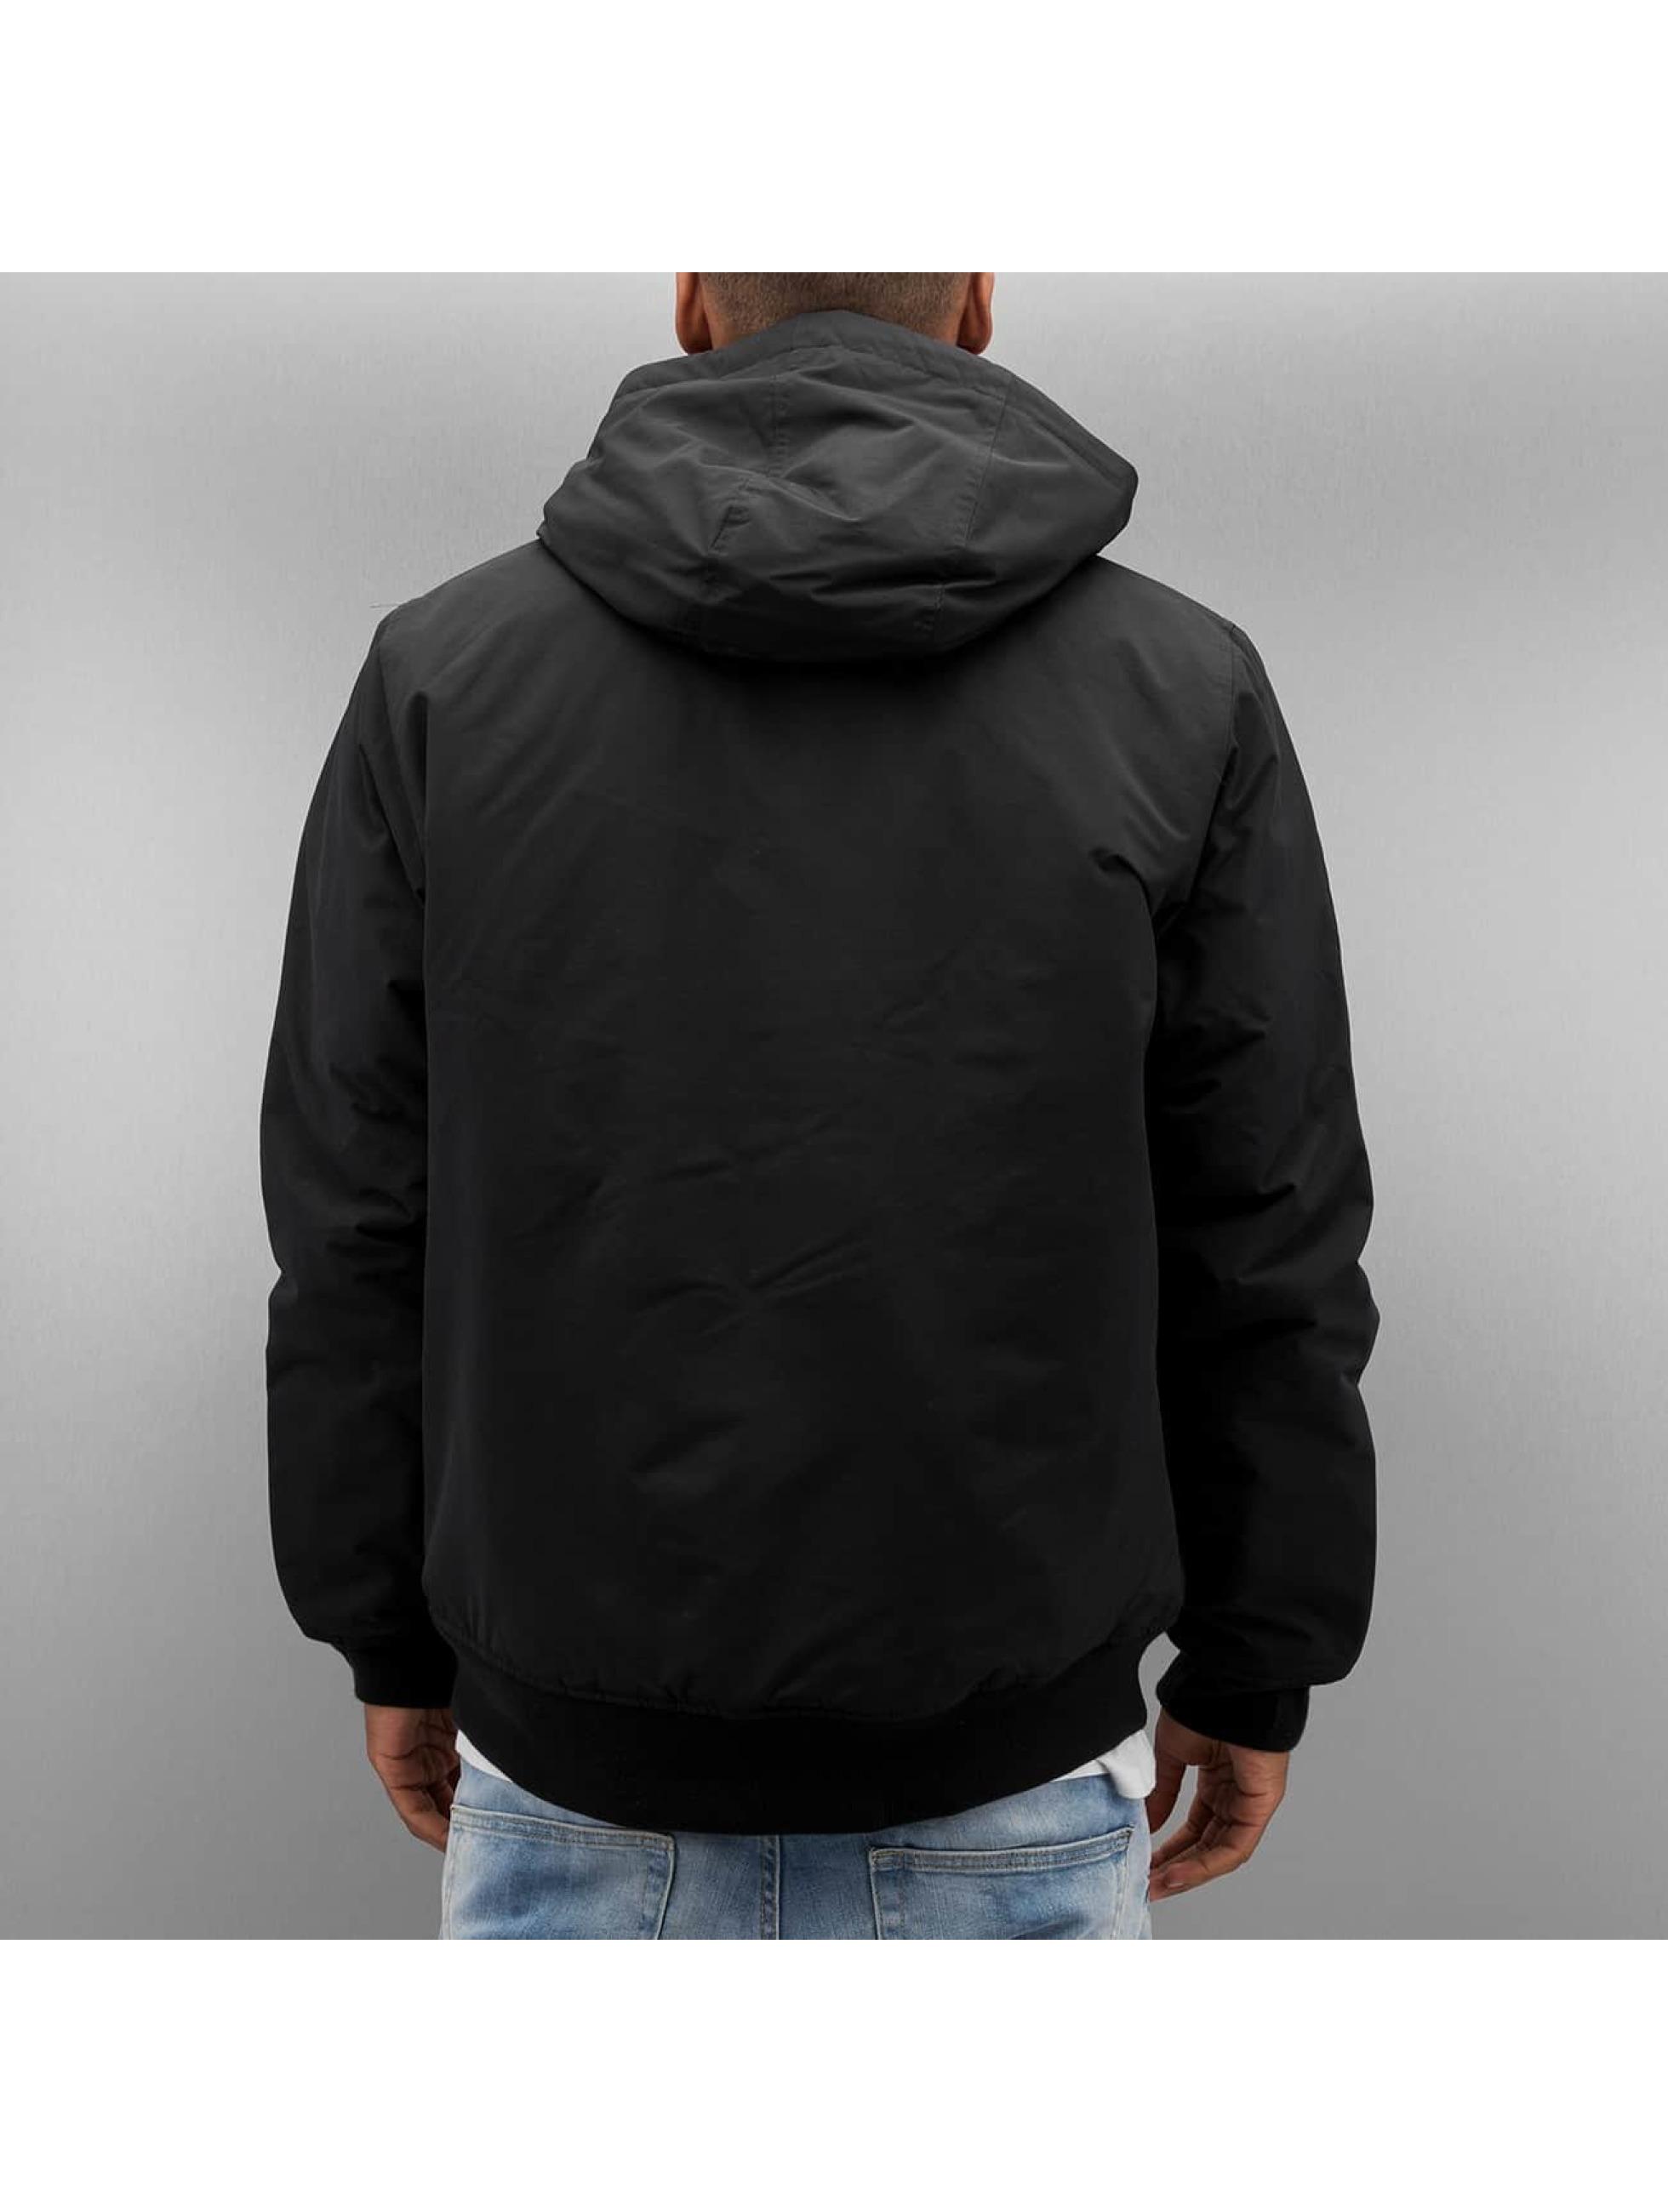 Carhartt WIP Winter Jacket Tactel Ottoman Kodiak Blouson grey